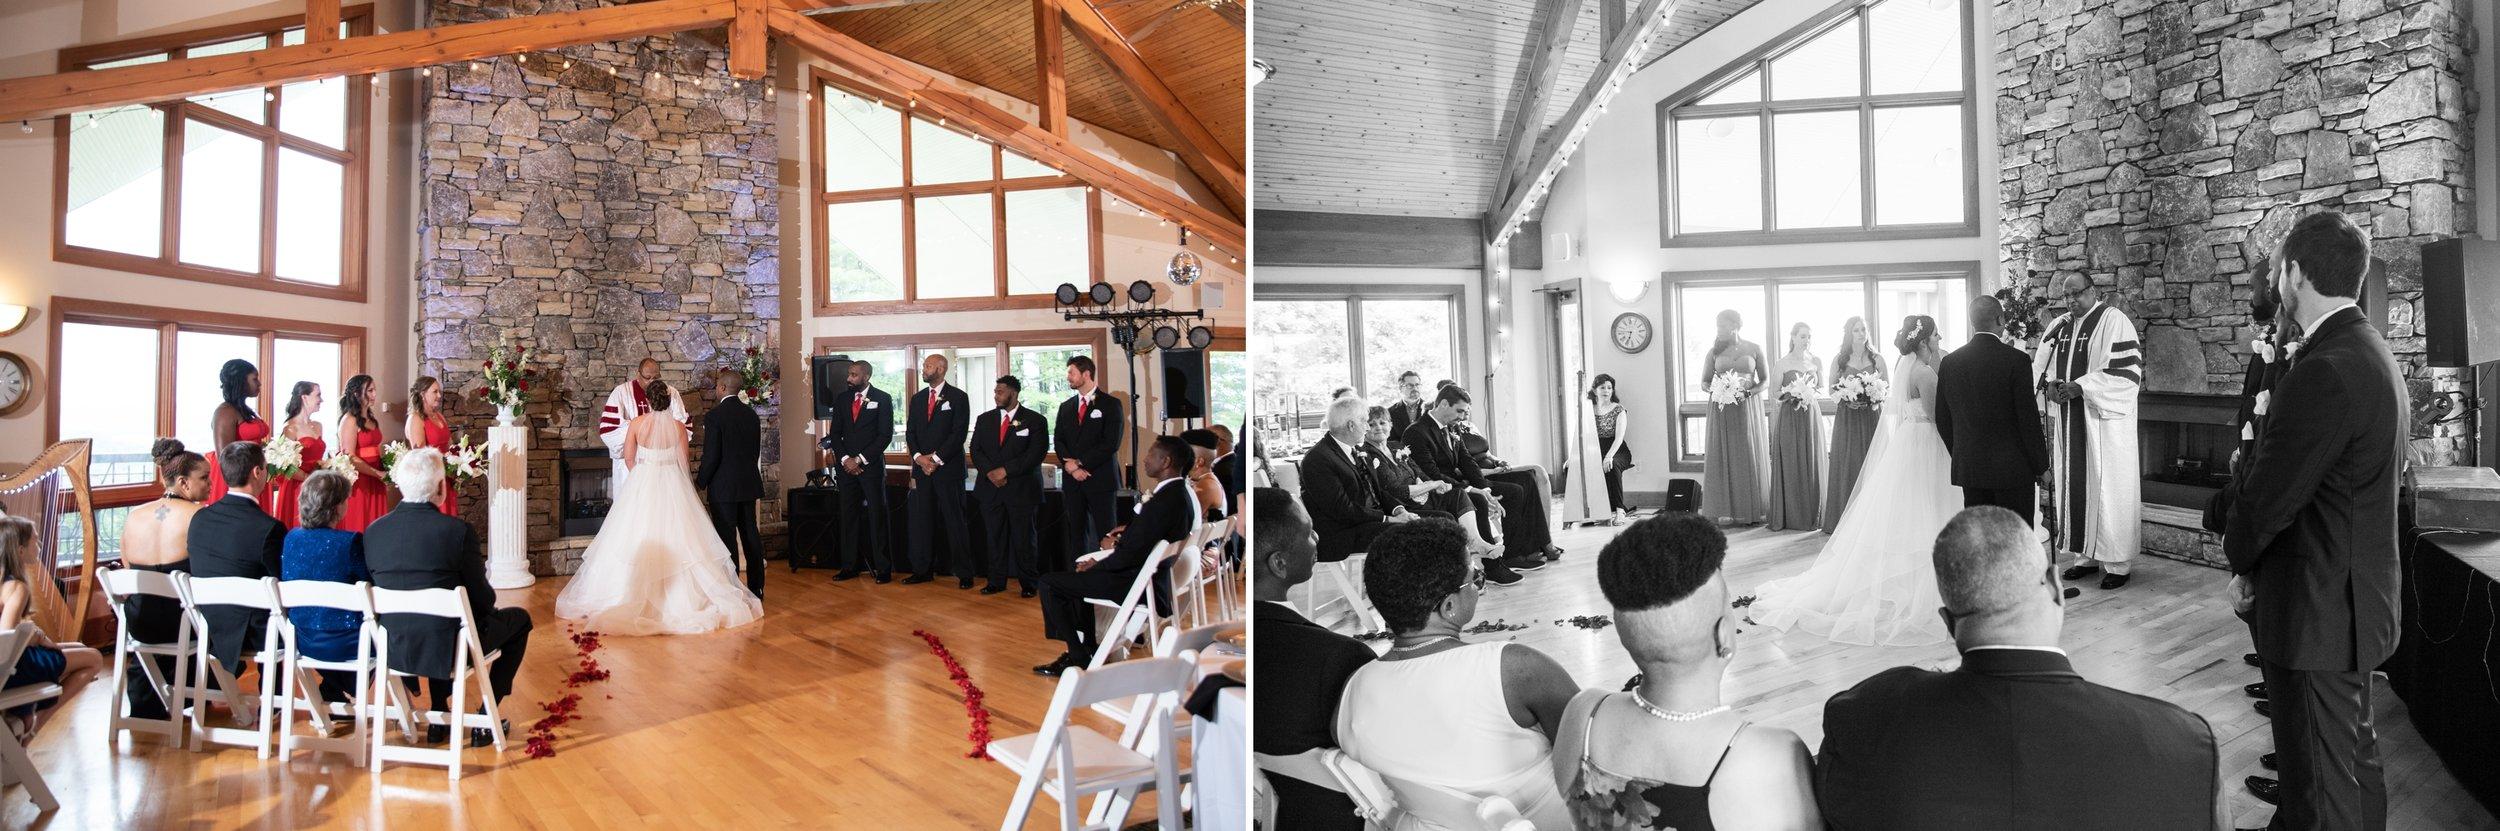 High Vista Weddings - Asheville Wedding 2 13.jpg